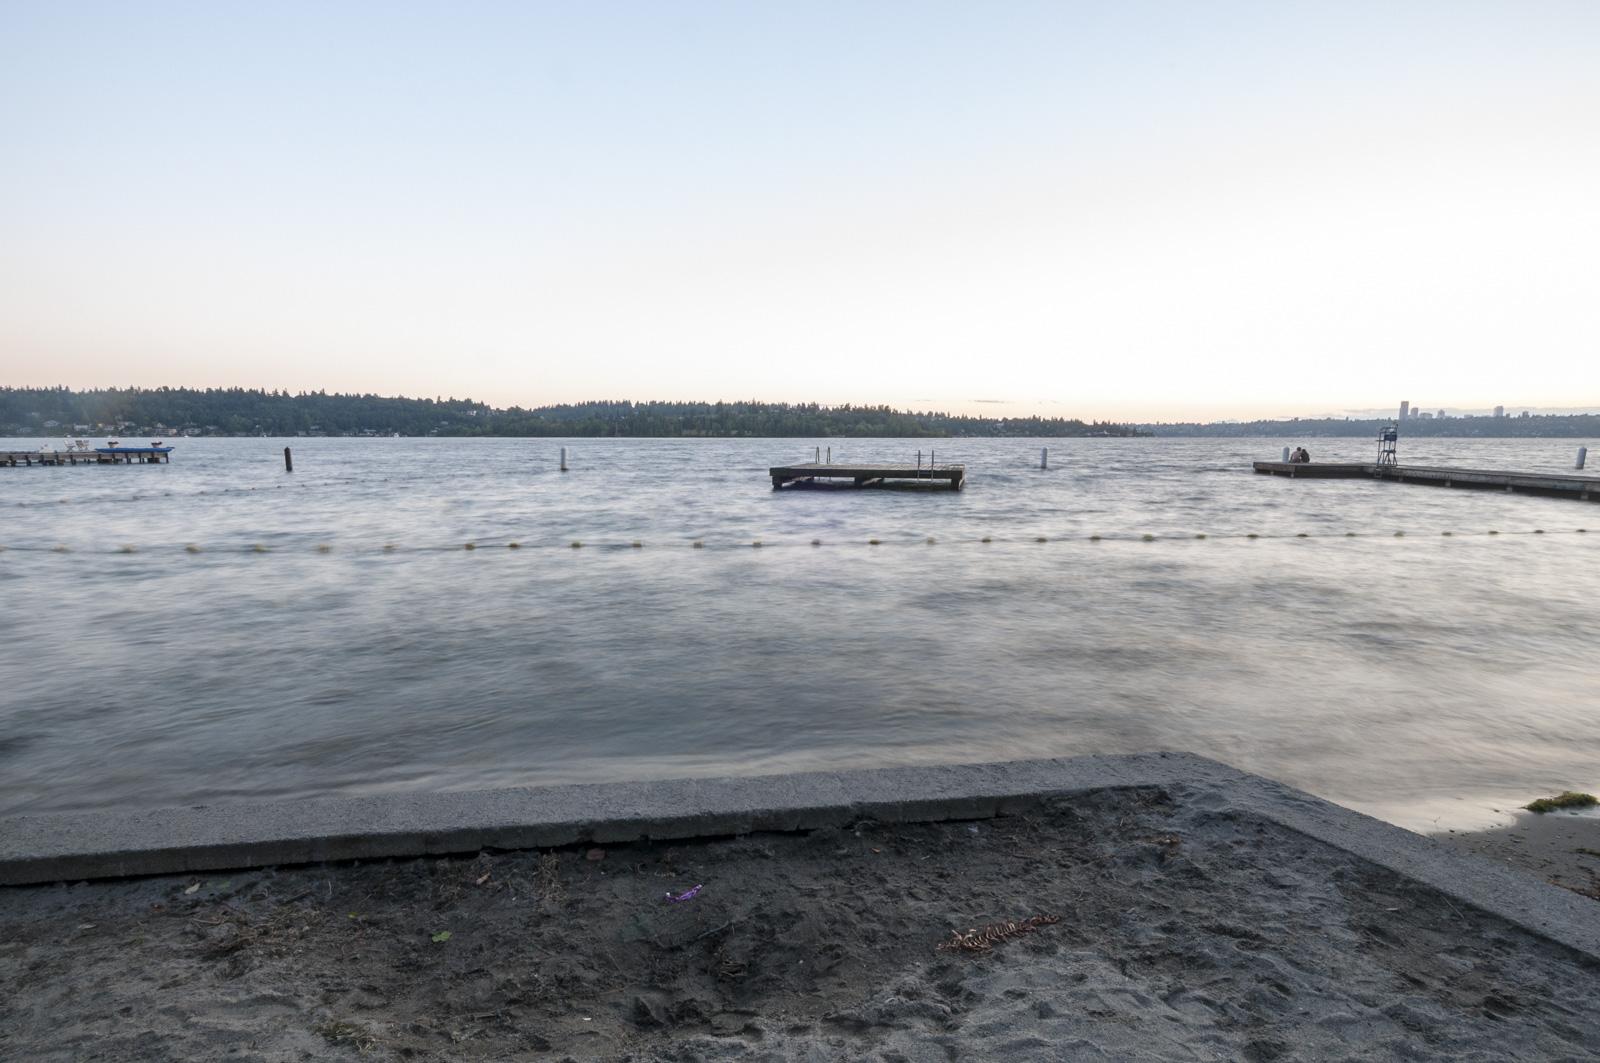 Chism Beach, Lake Washington, Bellevue, Washington 2016